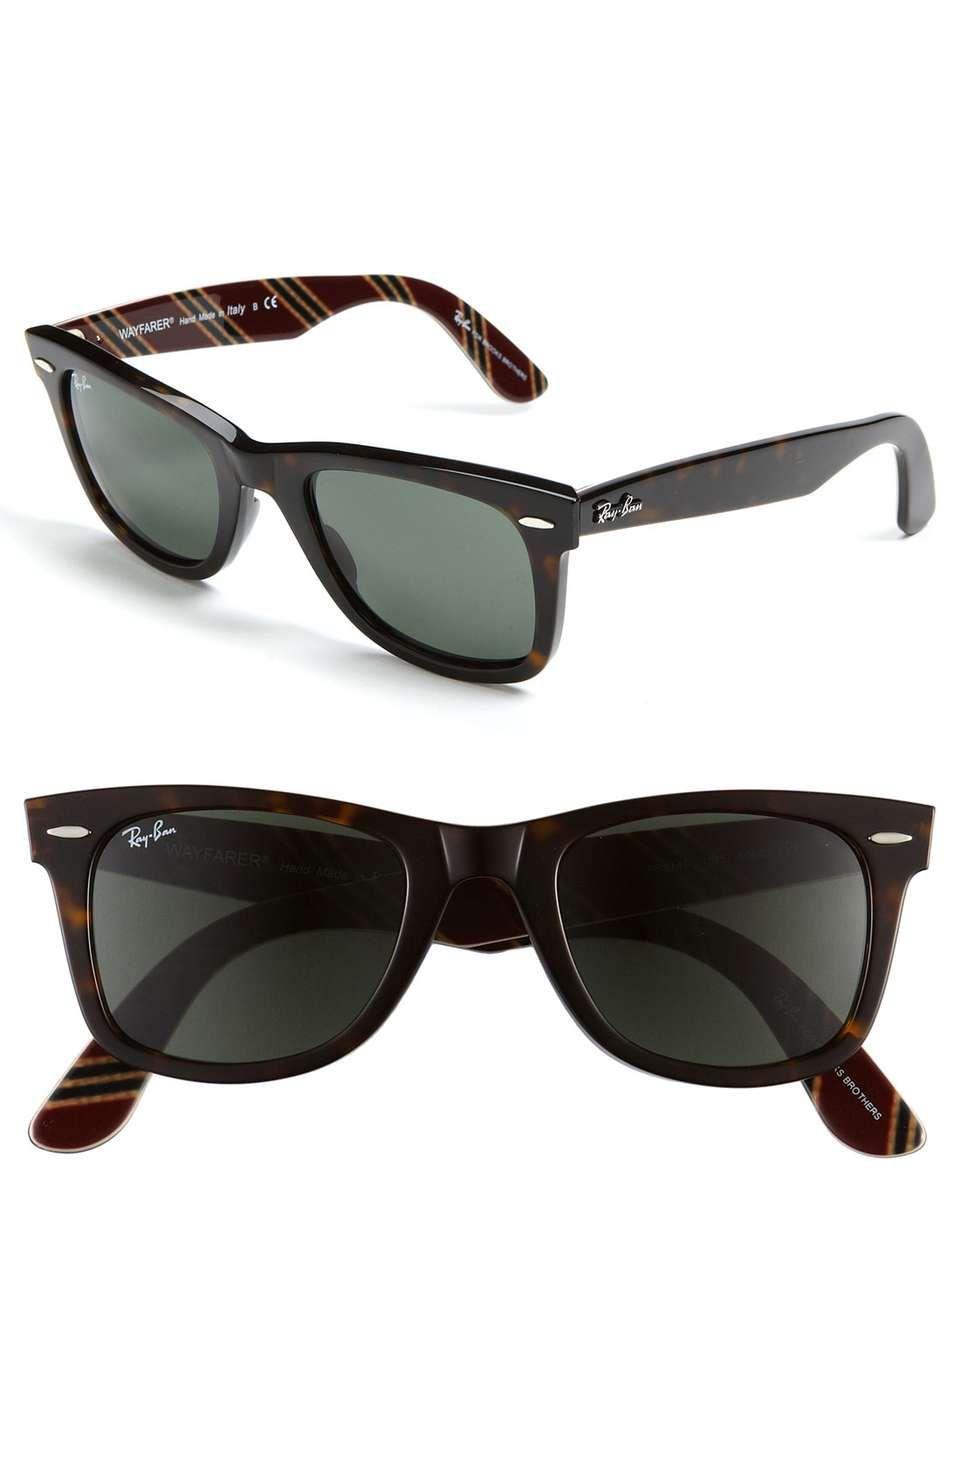 Ray Ban Classic Wayfarer 50mm Sunglasses Rayban Classic Sunglasses Mens Birthday Gifts